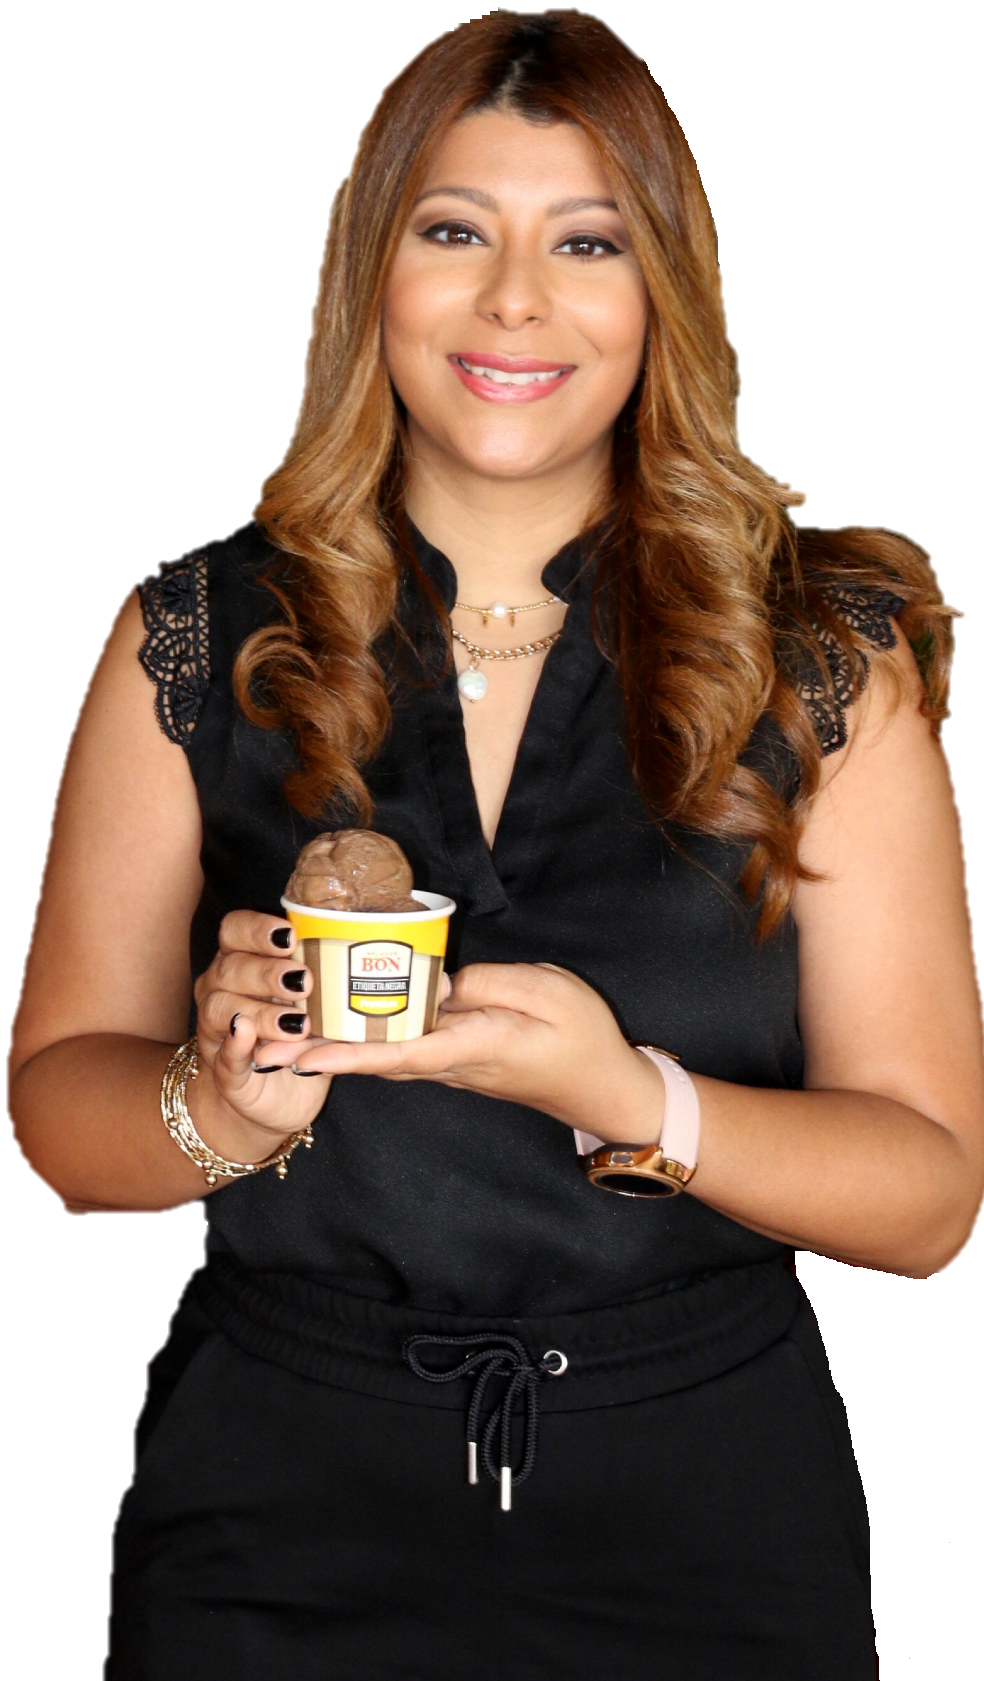 Laura Pérez, gerente de mercadeo de Helados Bon.